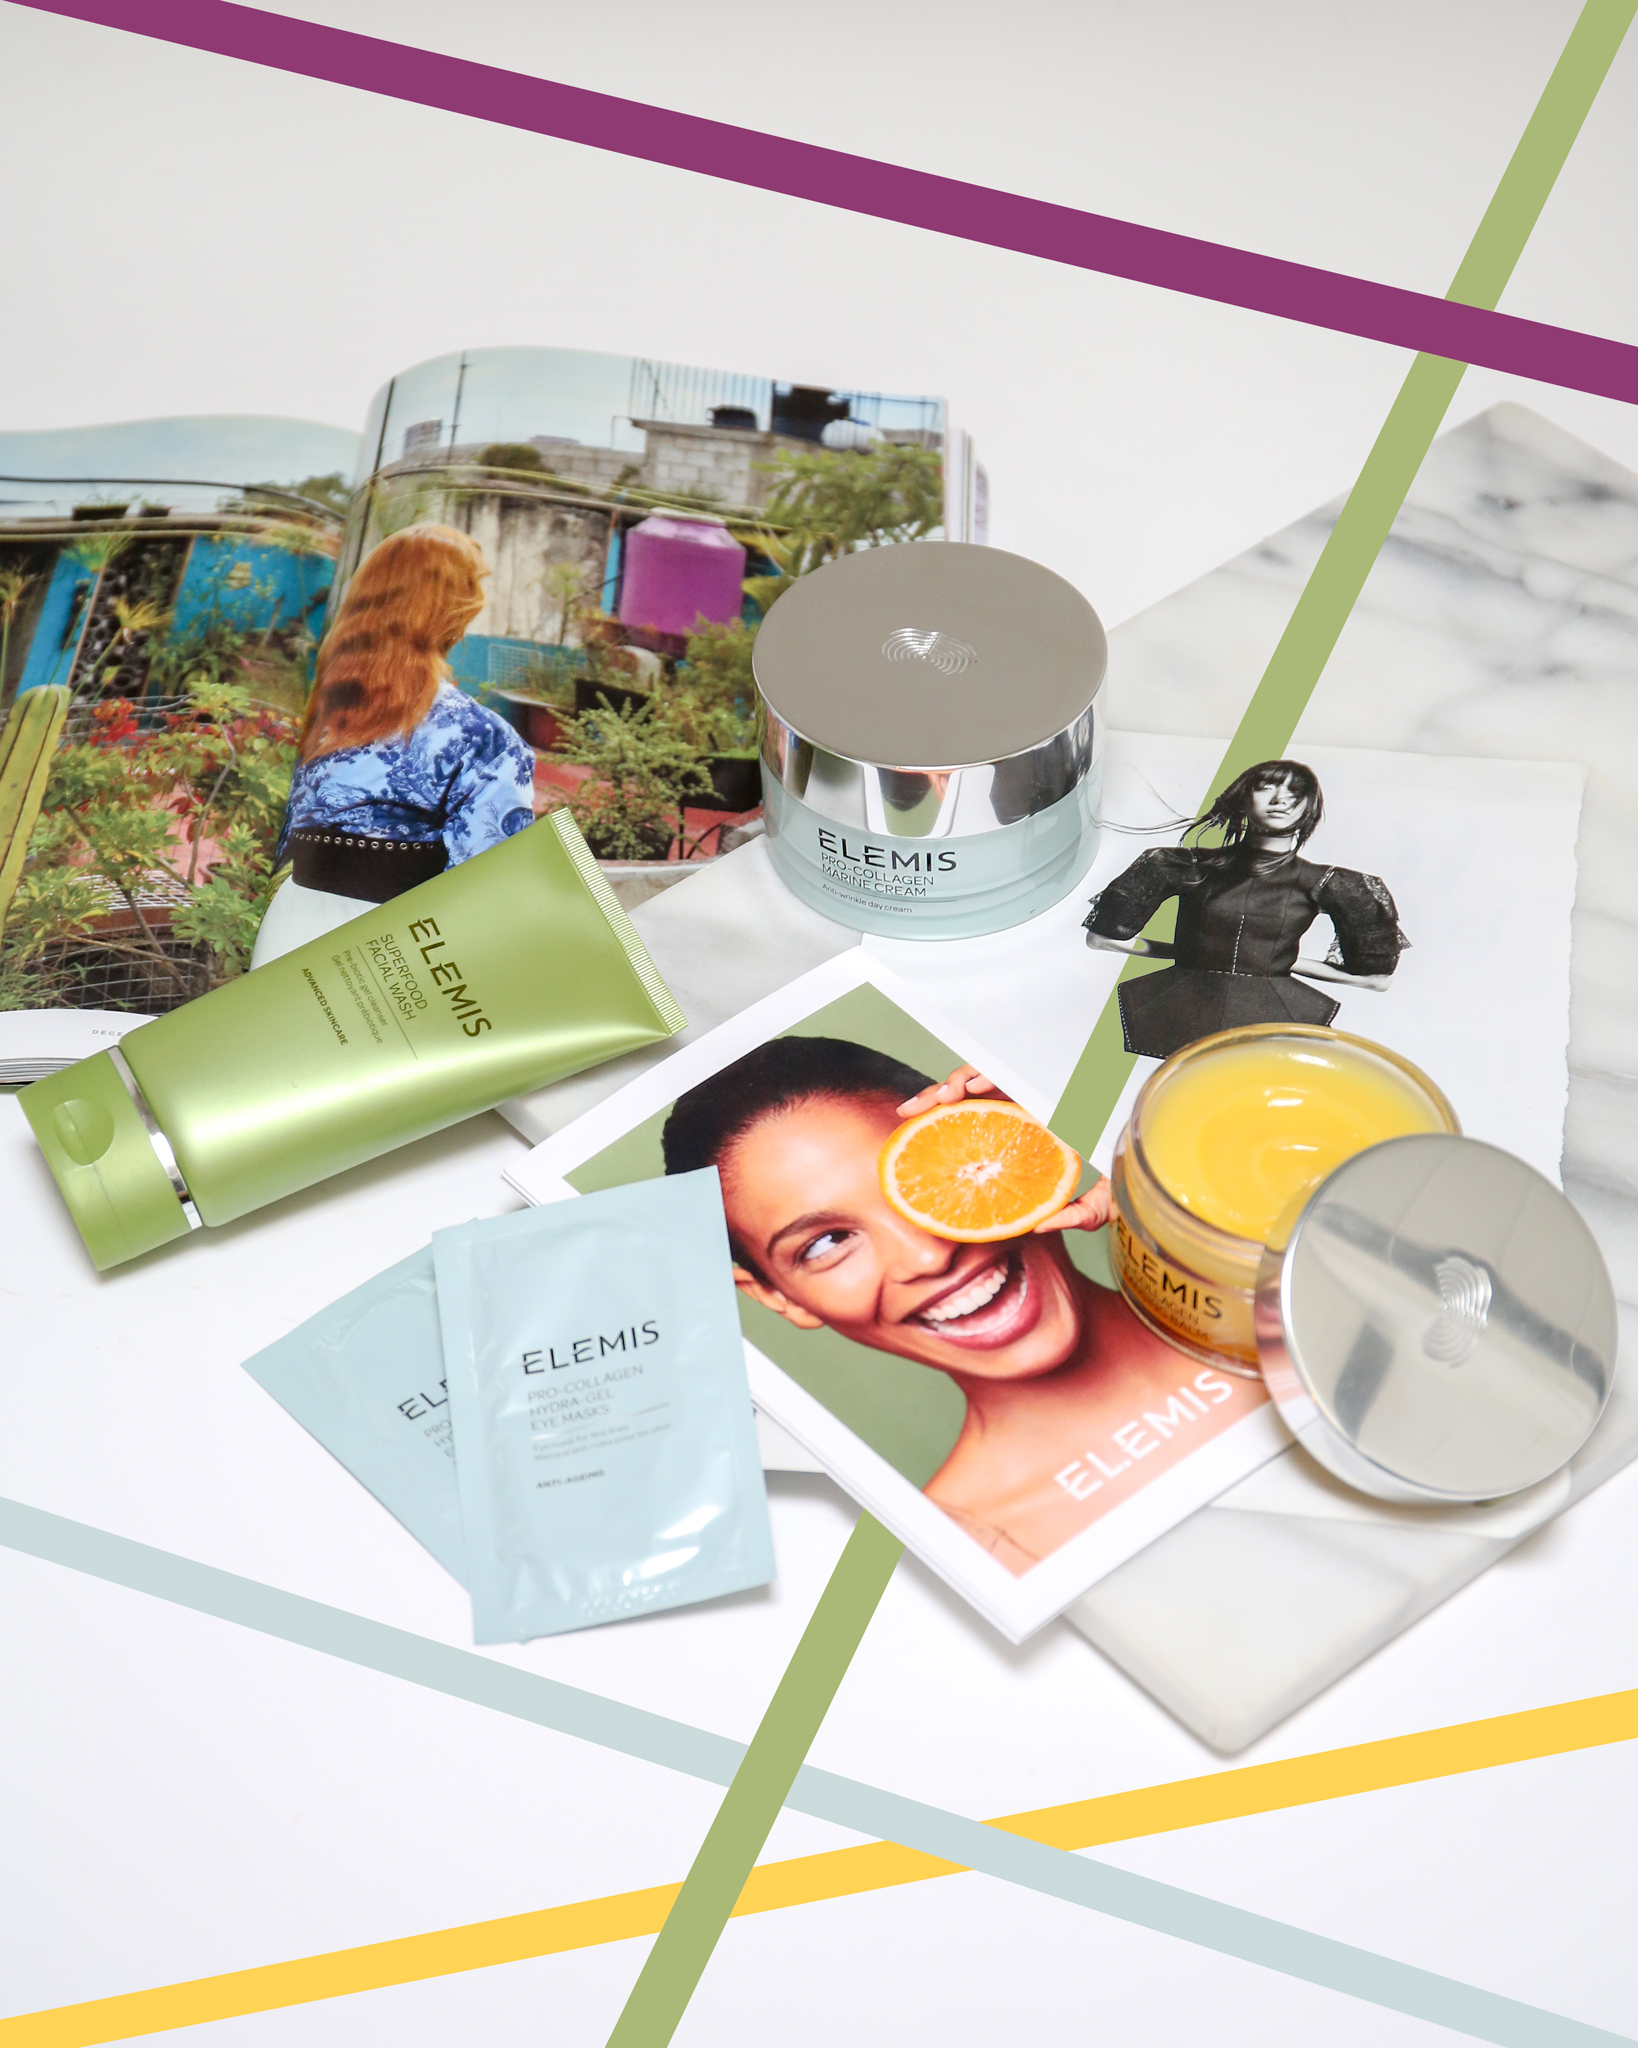 Elemis skincare products